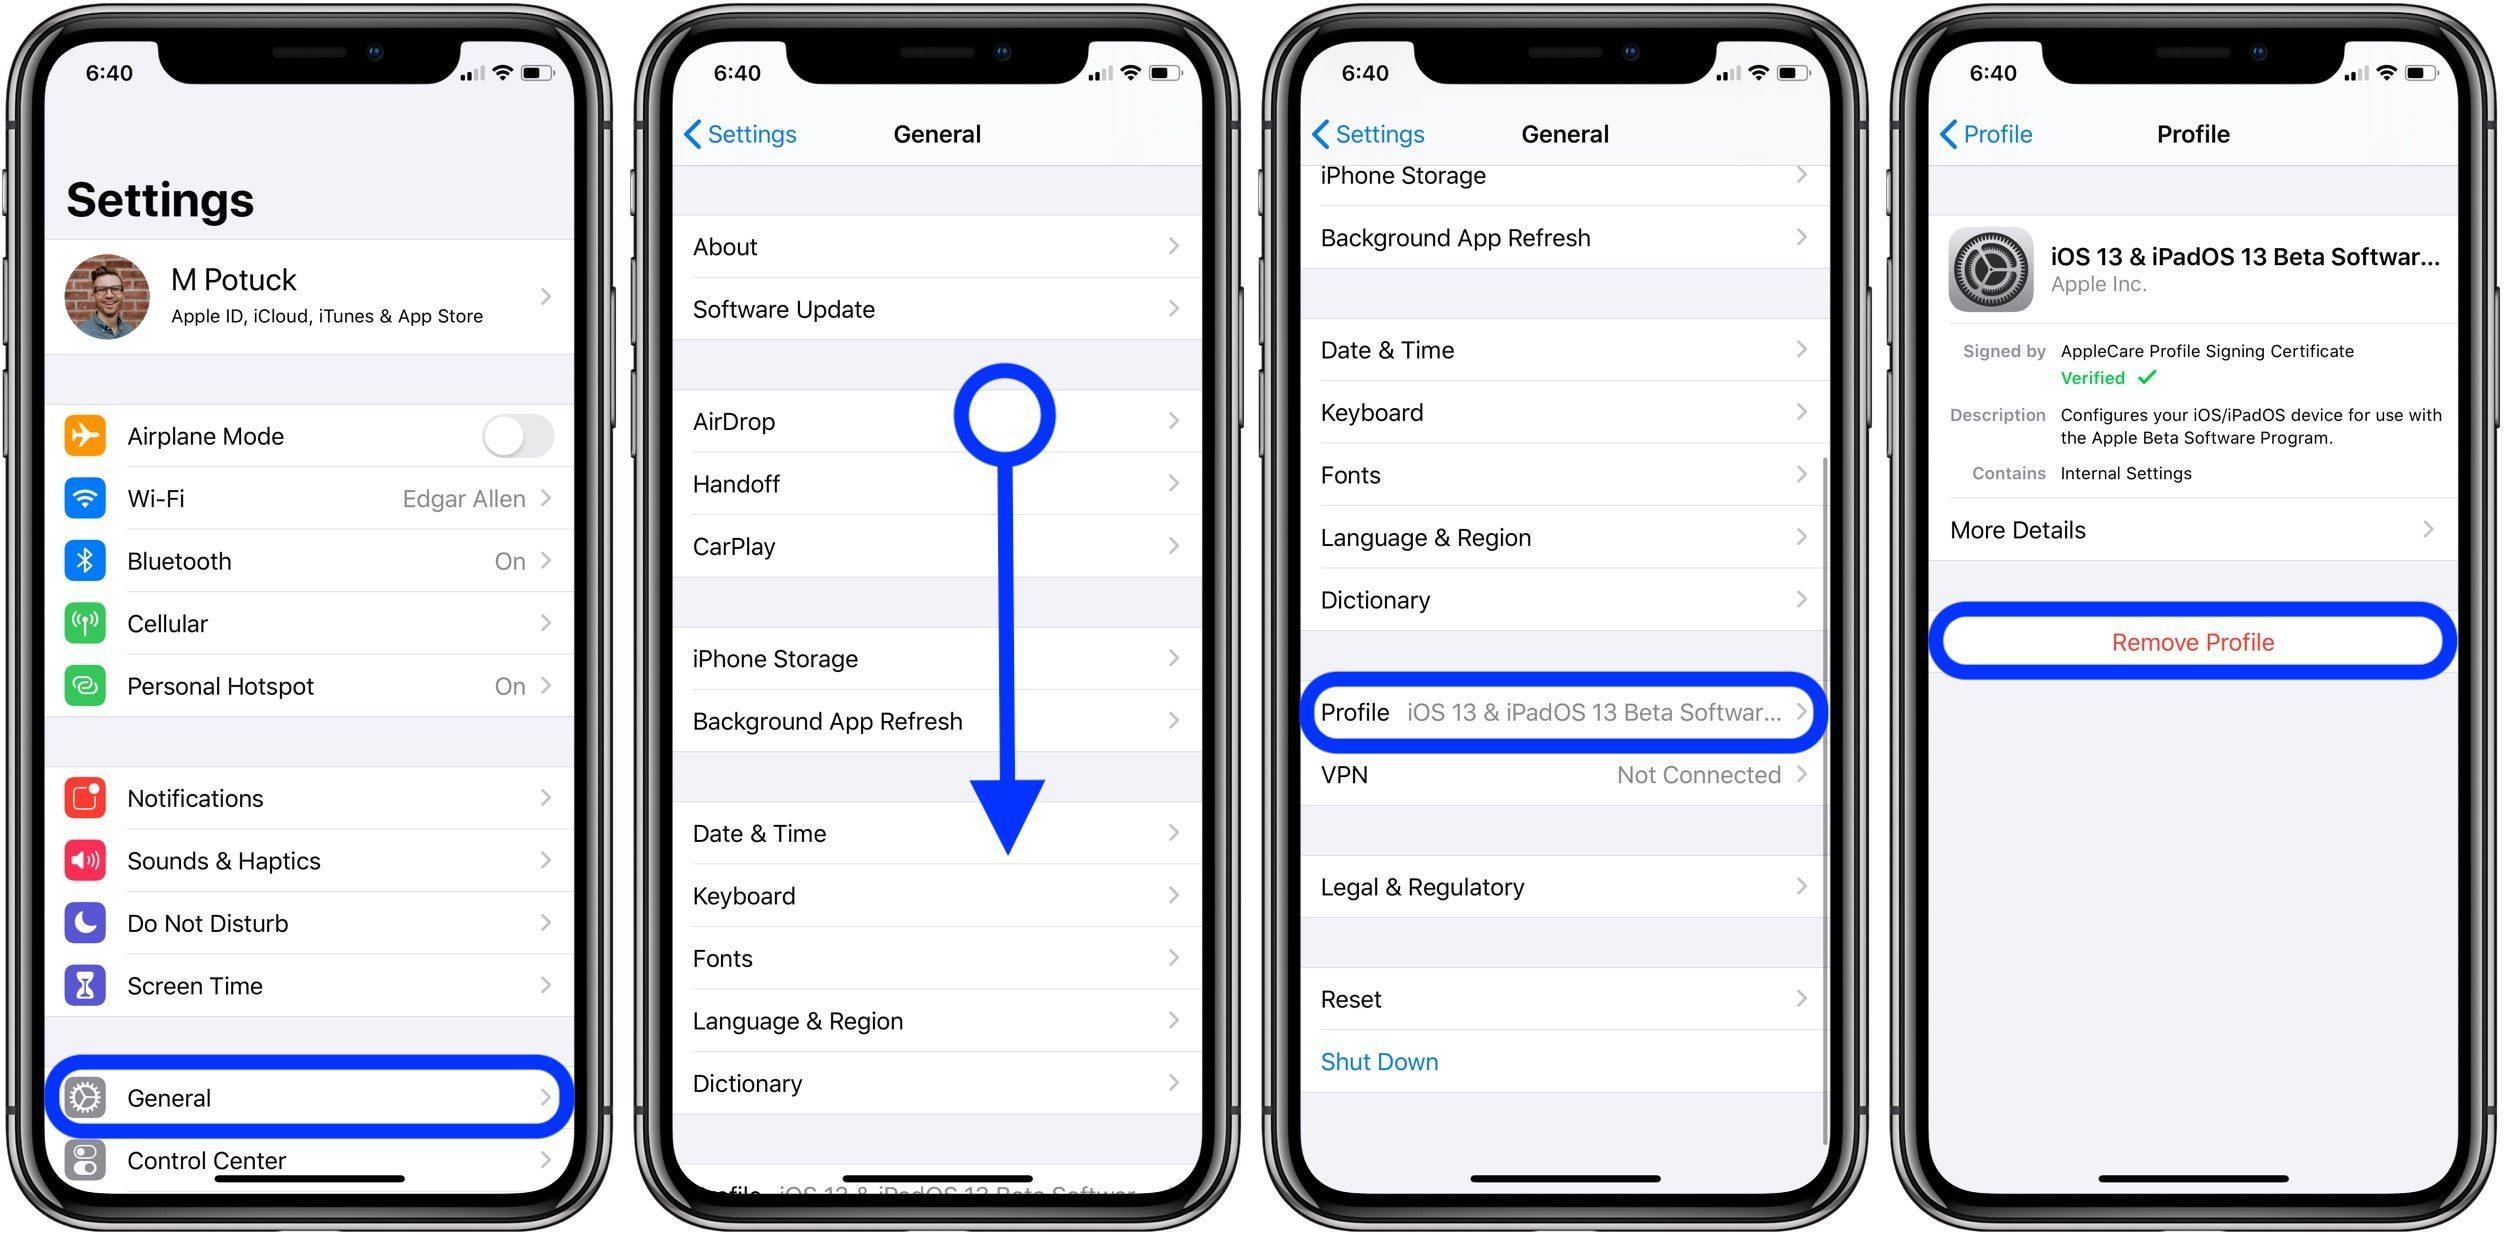 "<span href=""https://9to5mac.com/2019/08/30/downgrade-ios-13-beta/"">Cómo hacer downgrade de iOS 13.1 beta</a>"